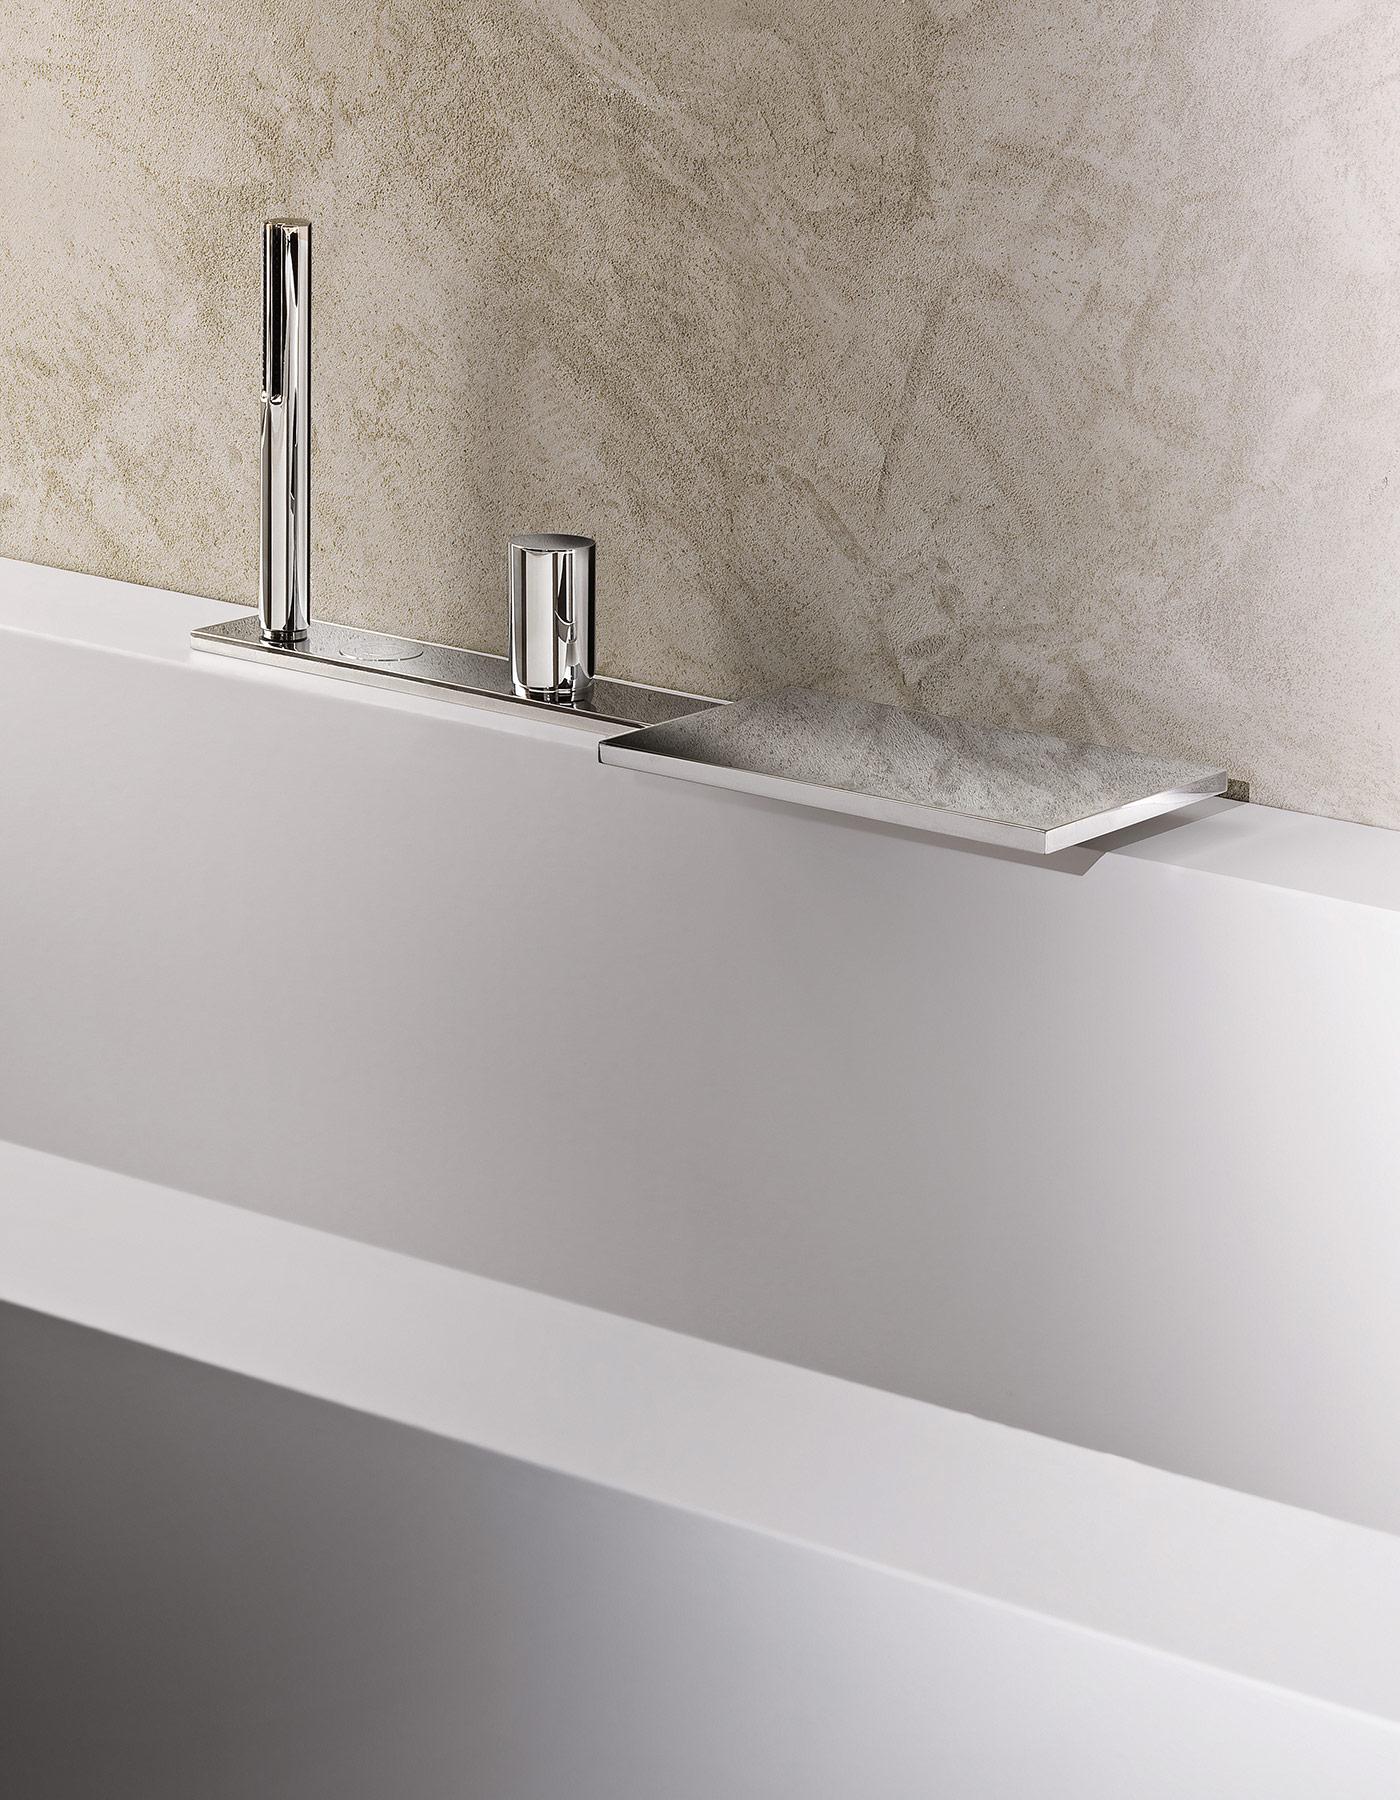 Modern Milano Deck Mount Tub Faucet